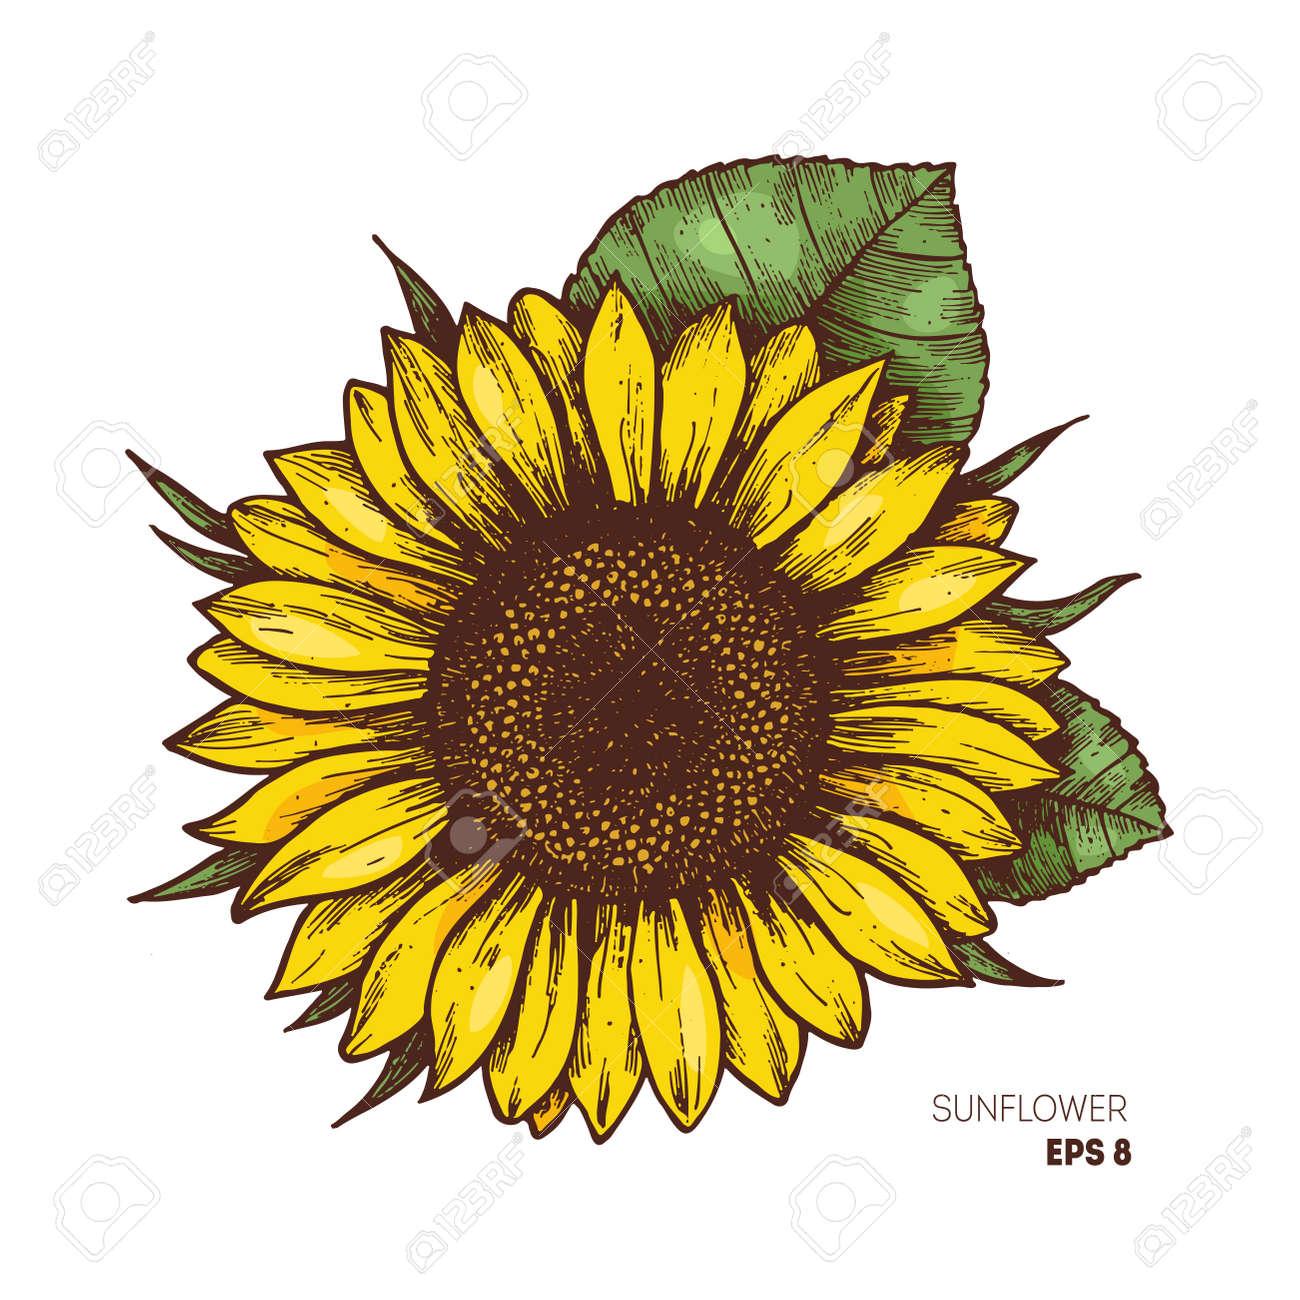 Sunflower vintage engraved illustration. Sunflower isolated . Vector illustration - 87877150